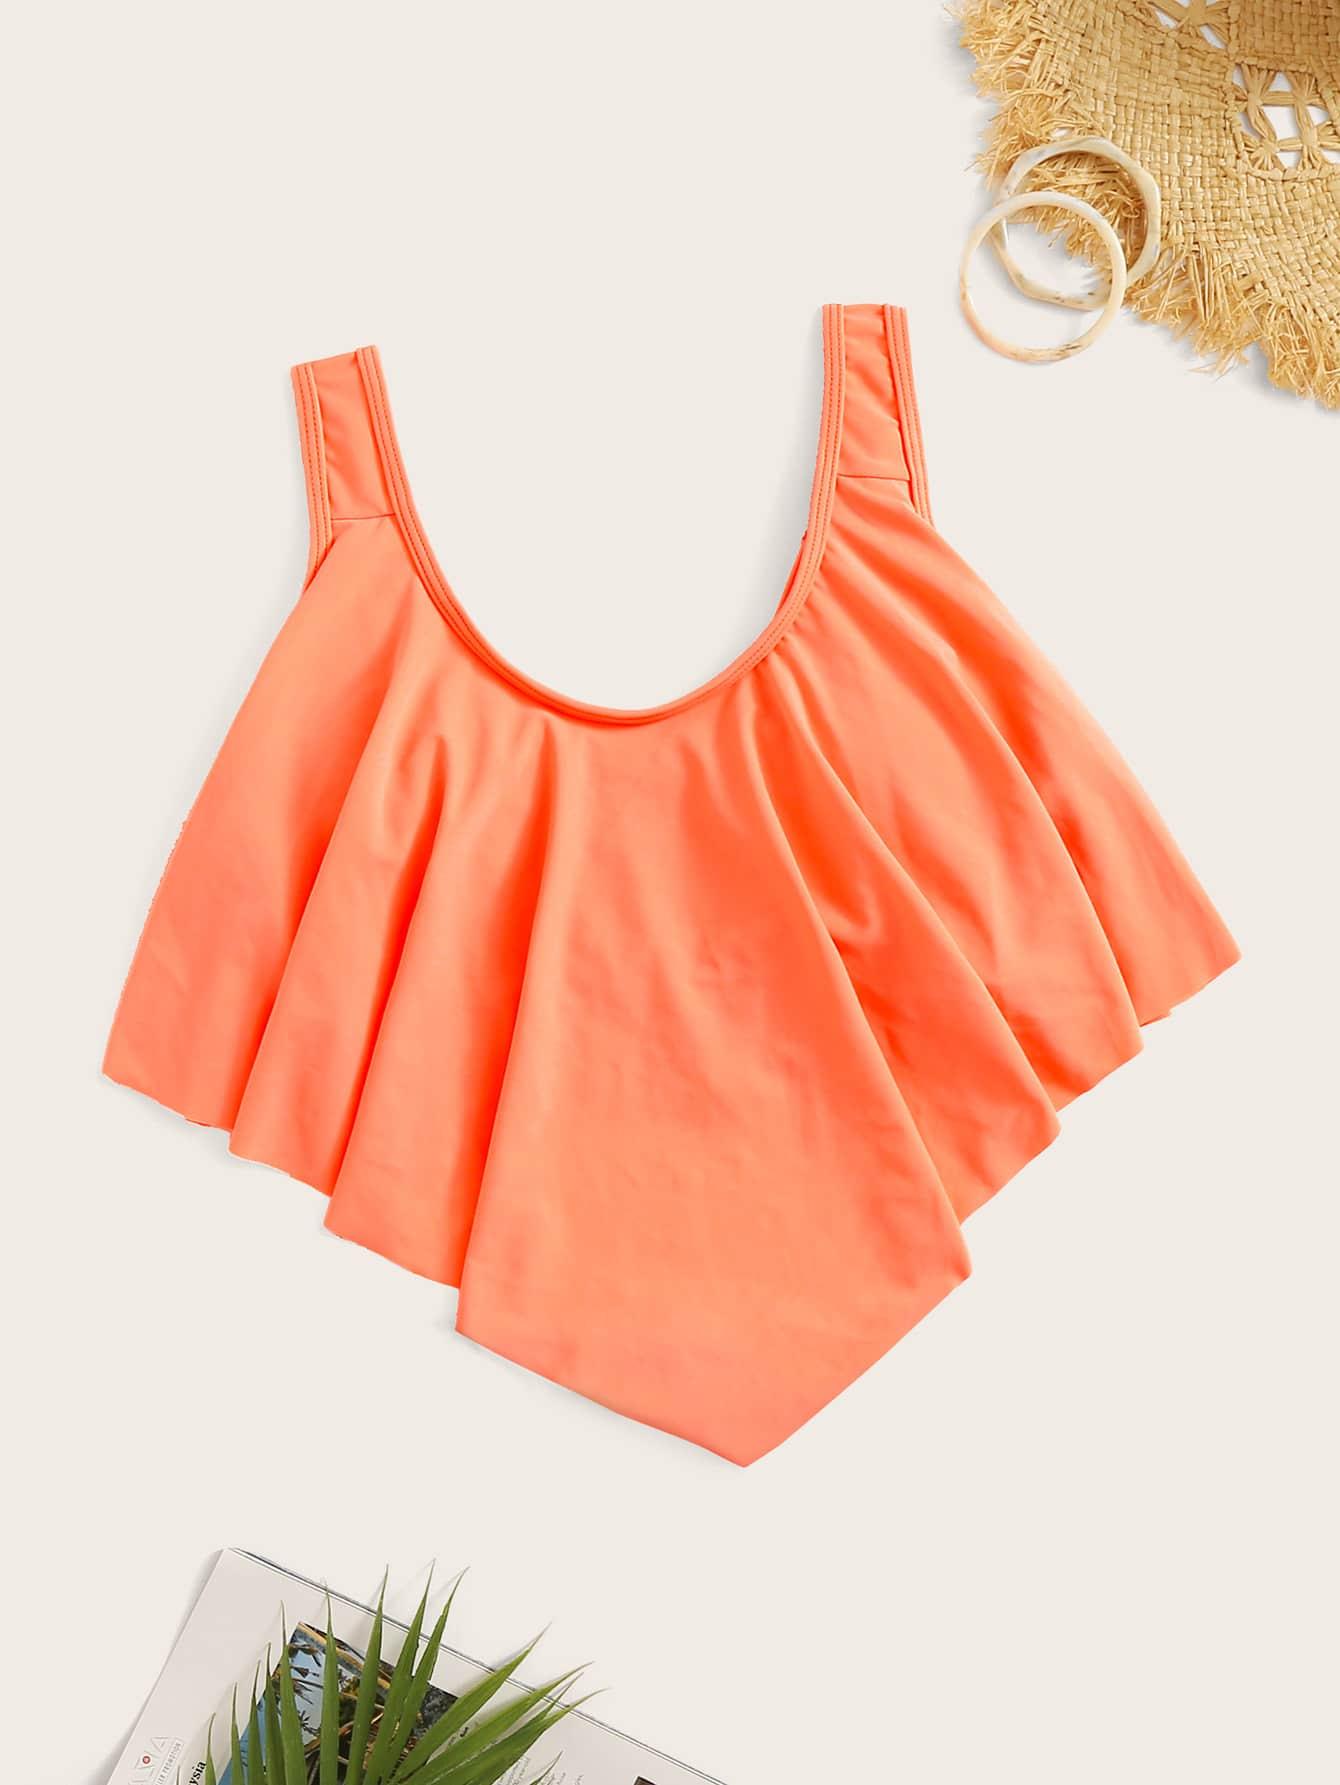 Фото - Топ для плавания от SheIn оранжевого цвета